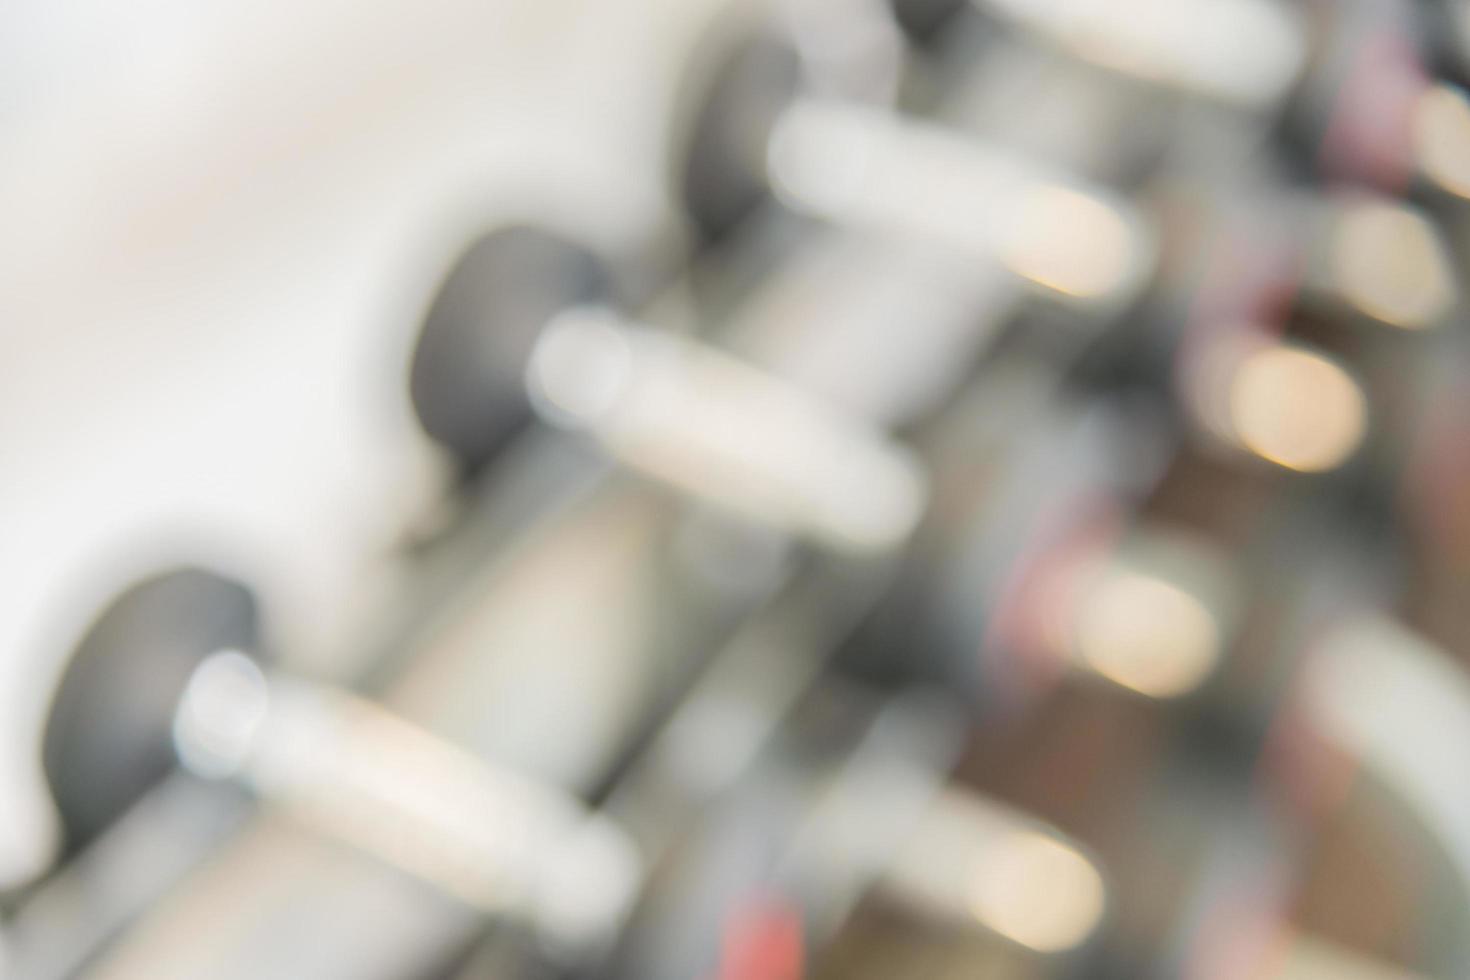 suddiga hantlar i gymmet, bakgrund foto